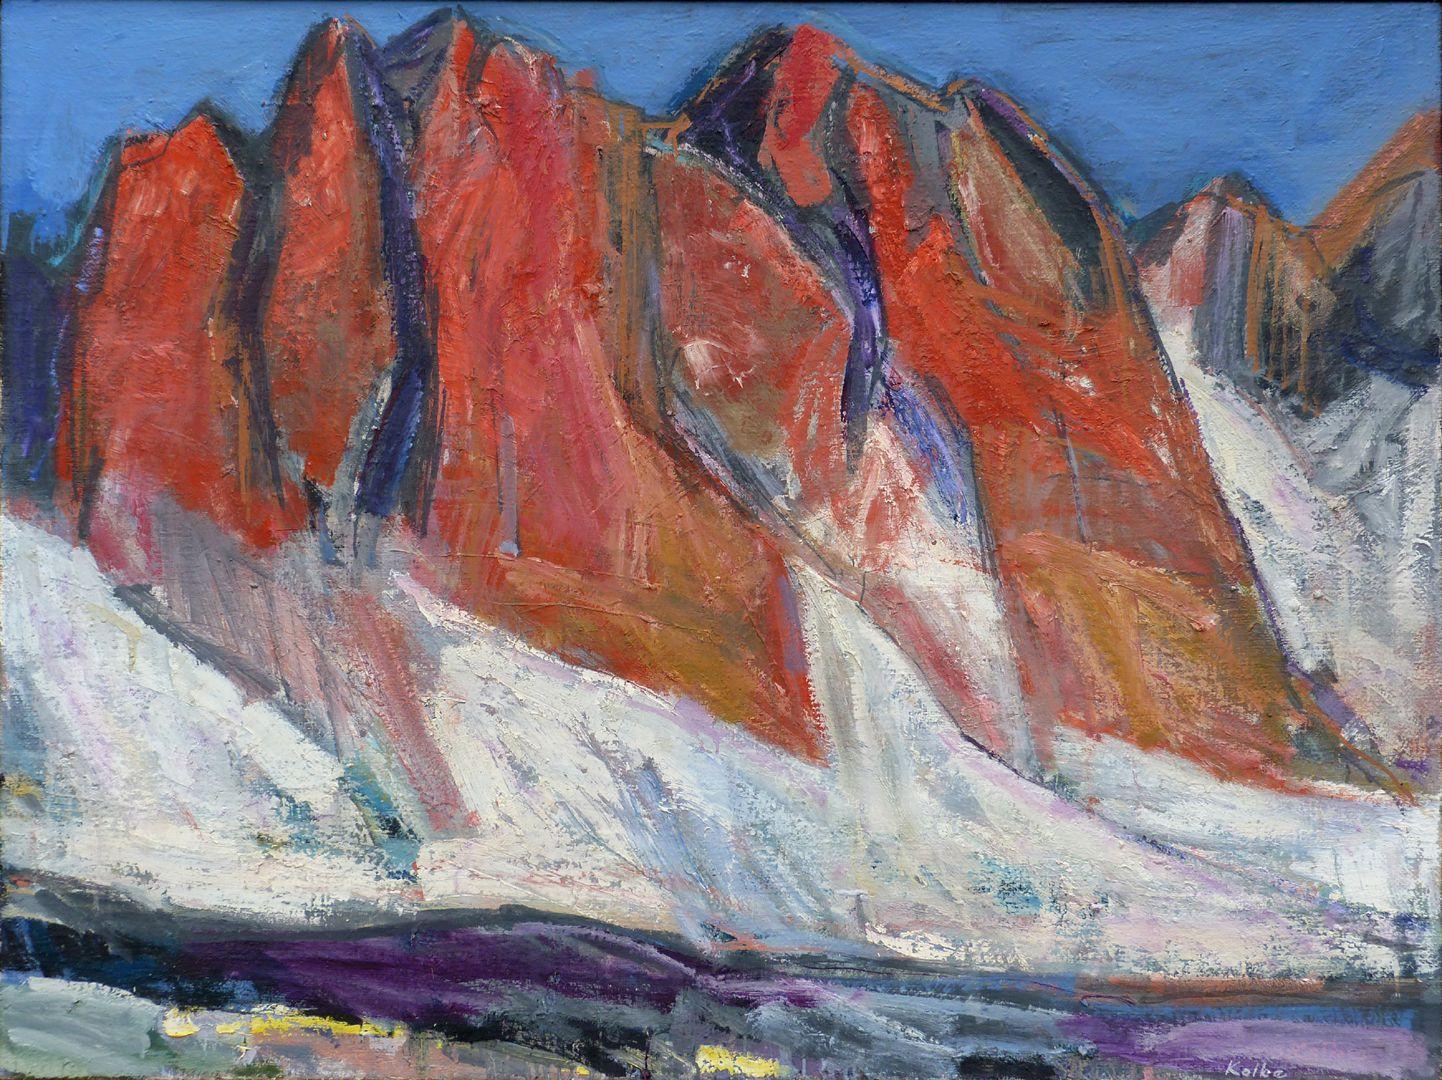 Dolomites: The Geisler Peaks